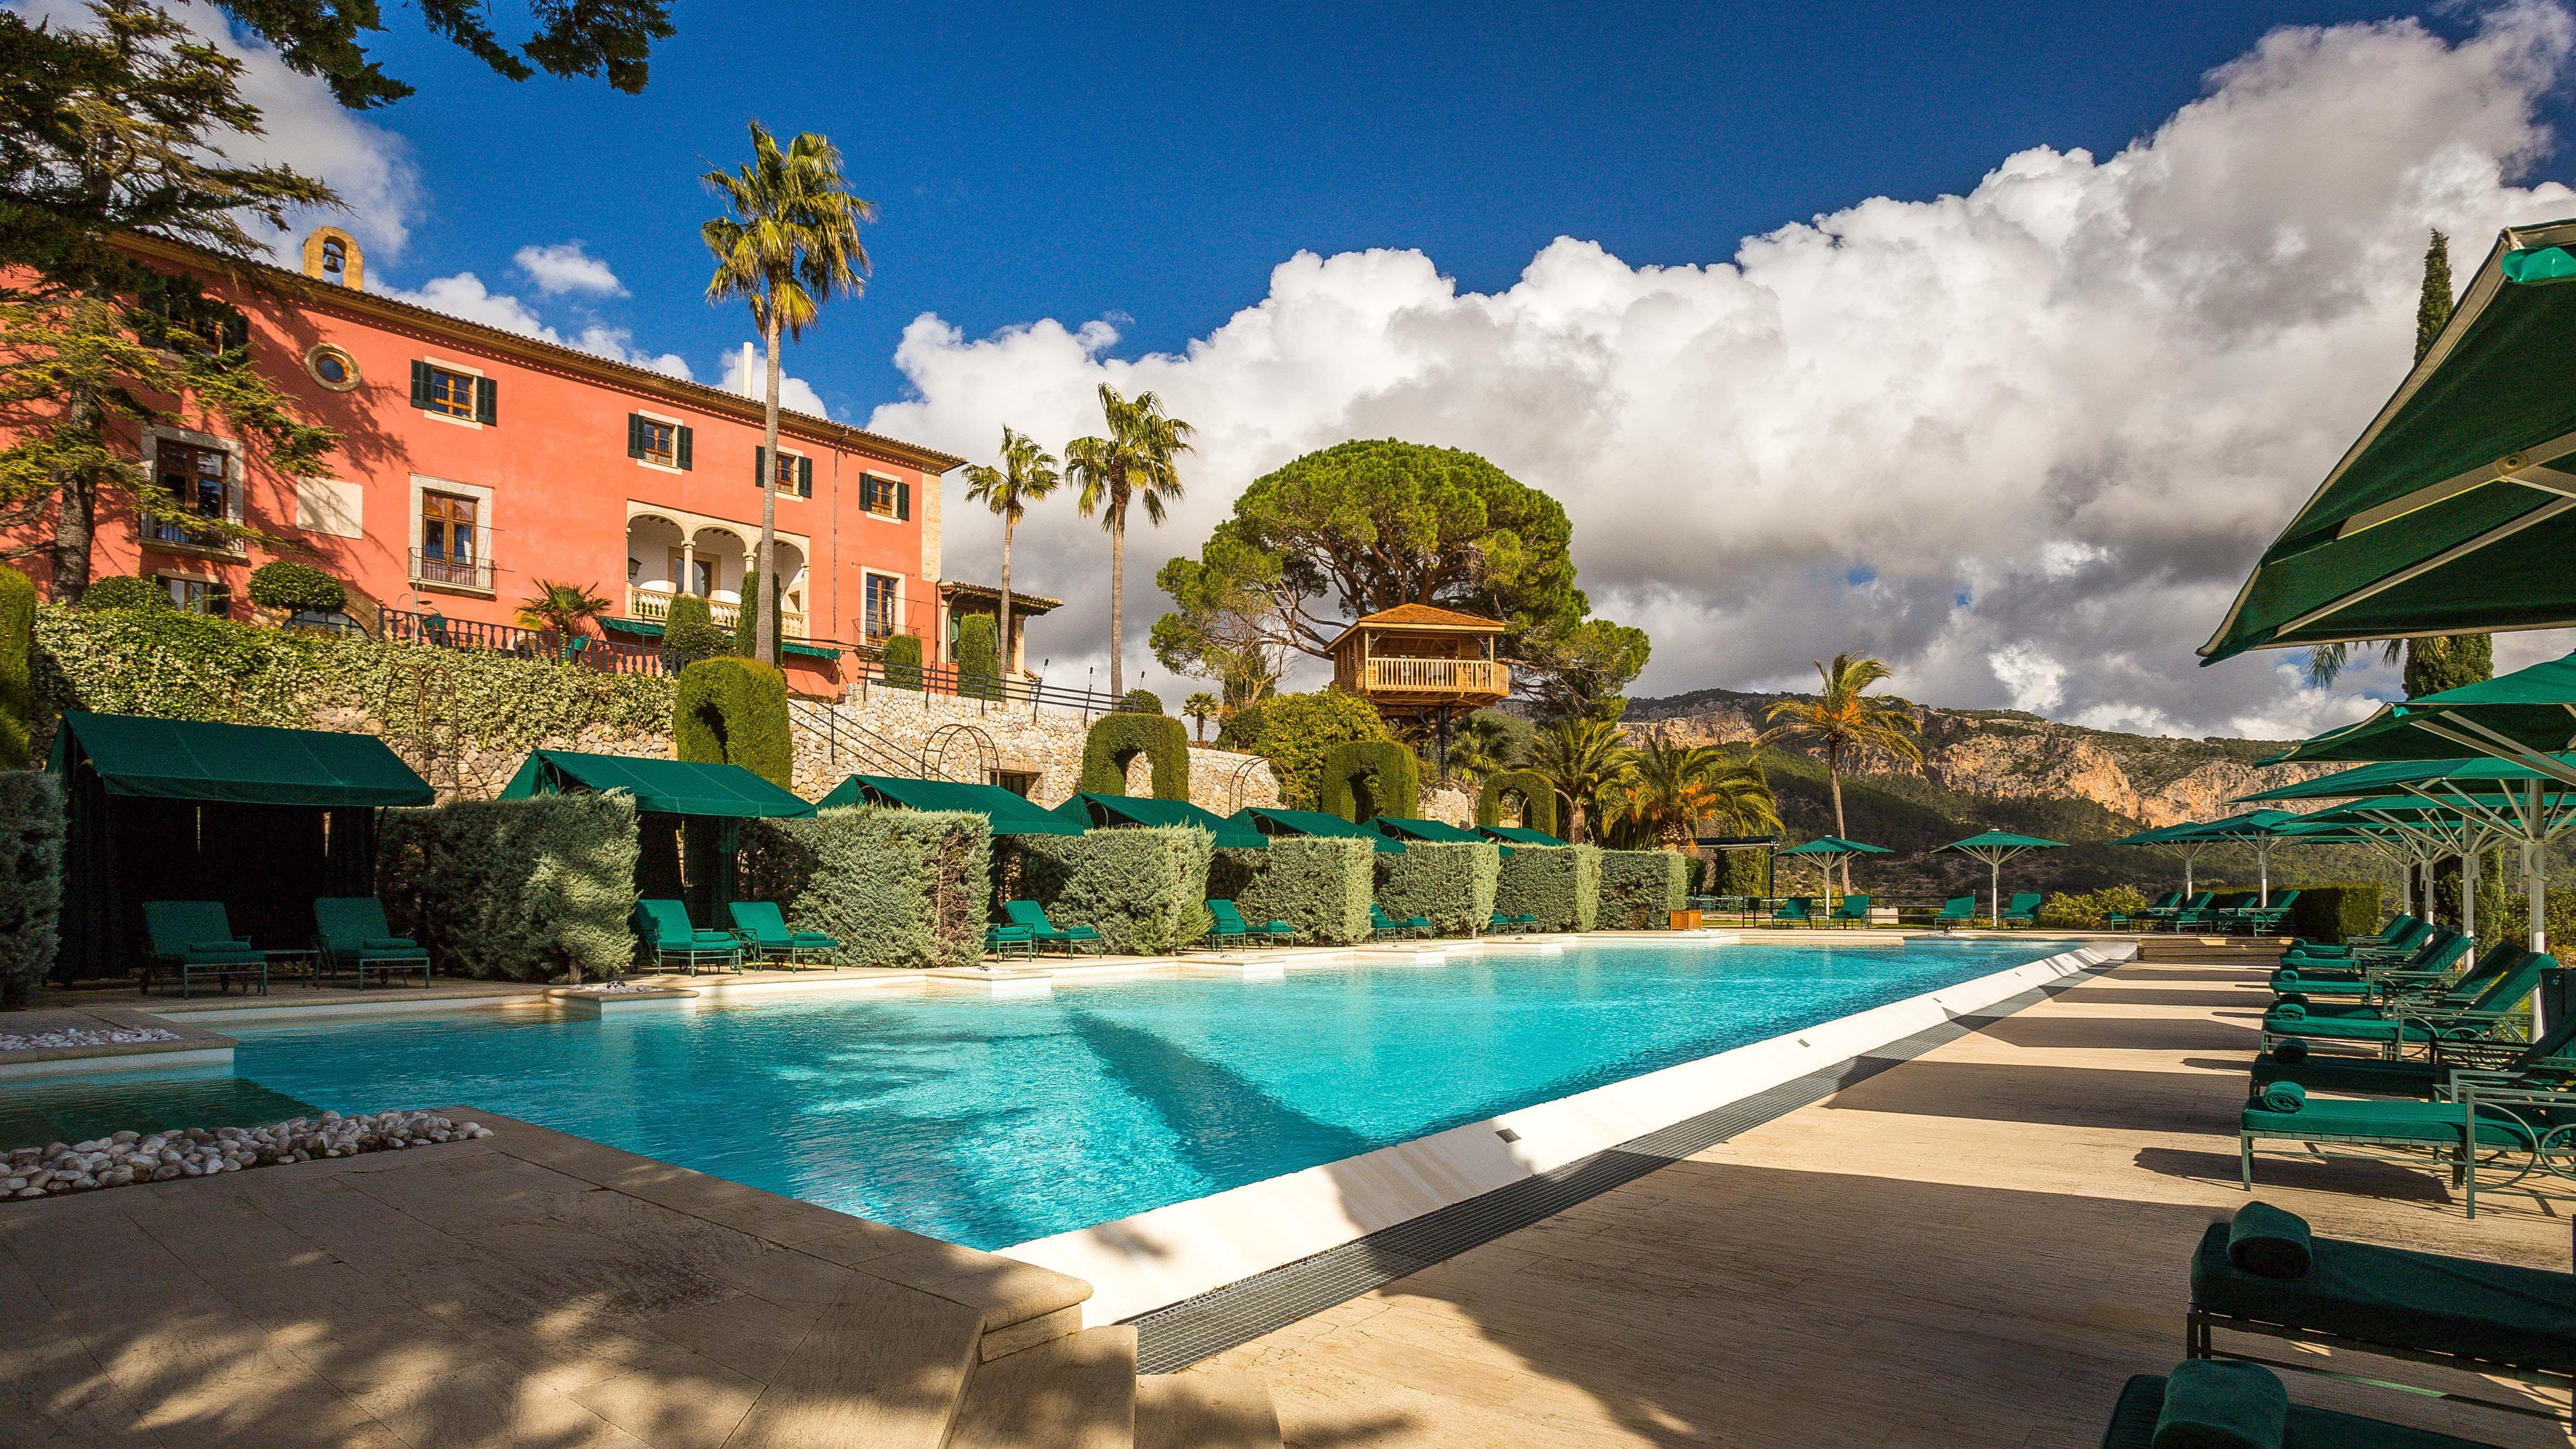 Gran Hotel Son Net, #Mallorca #Spain - Pool and Treehouse